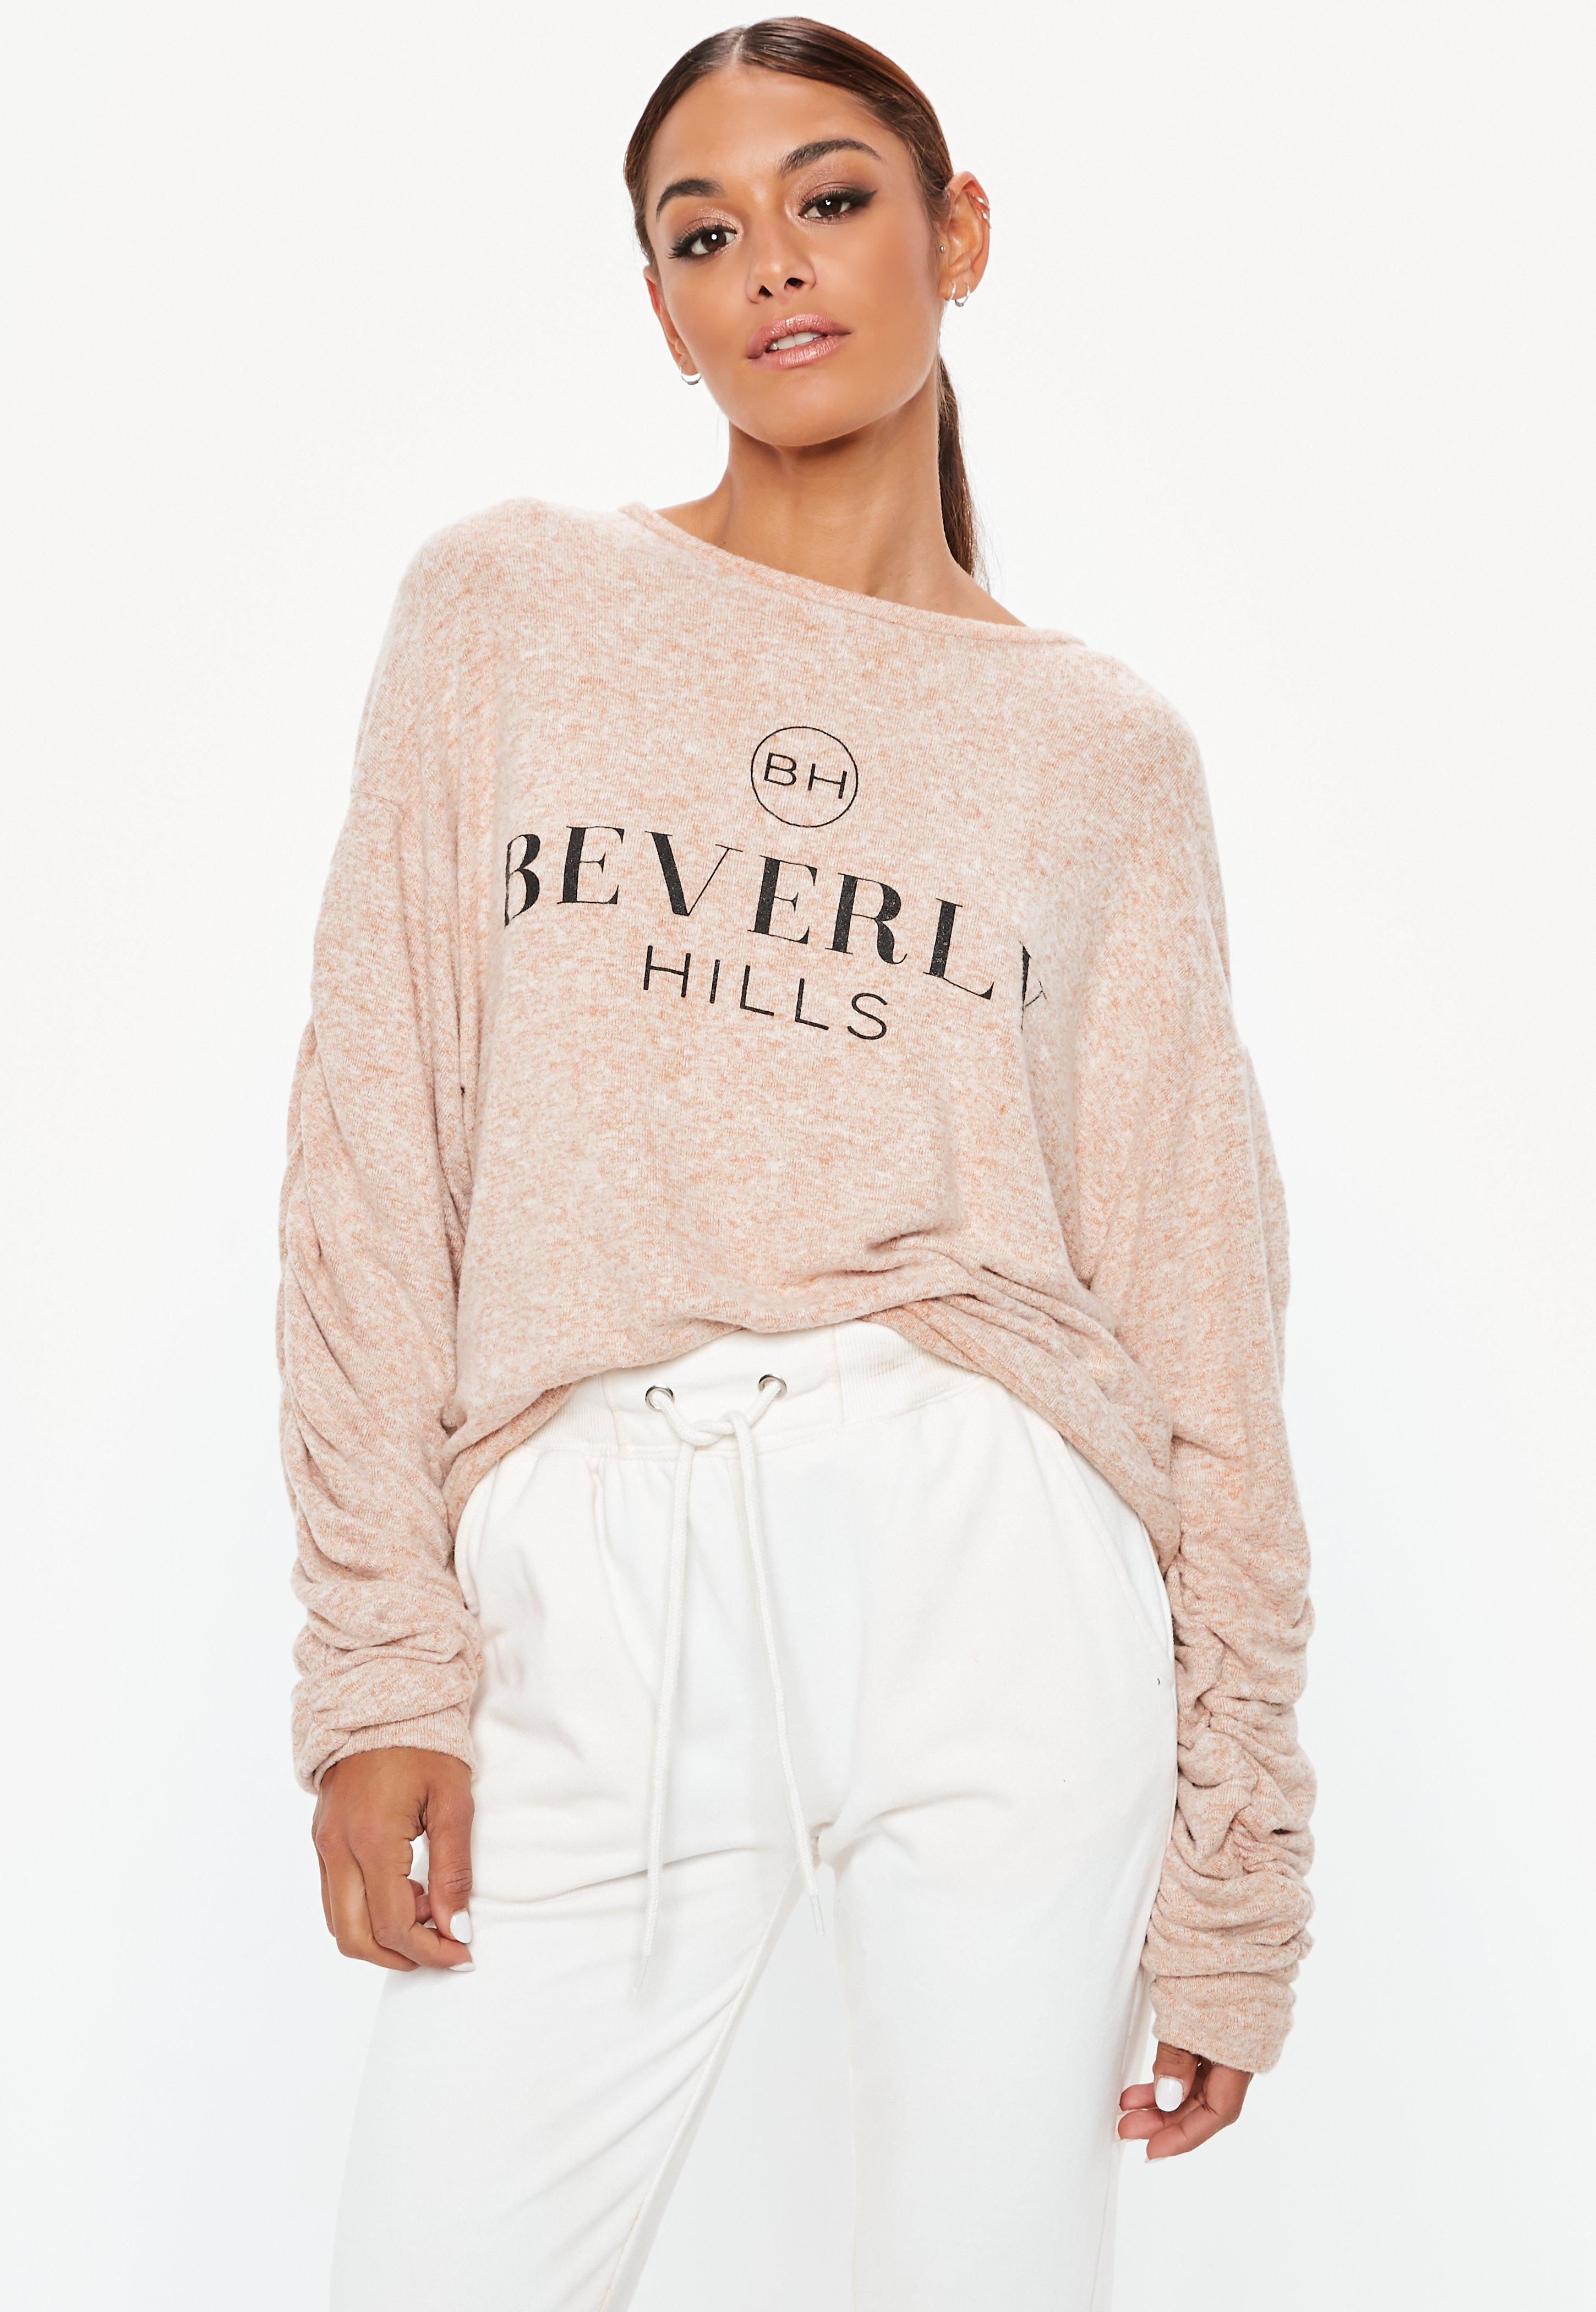 Missguided Beverly Hills Slogan Brushed Sweatshirt Buy Online P568WQoQT